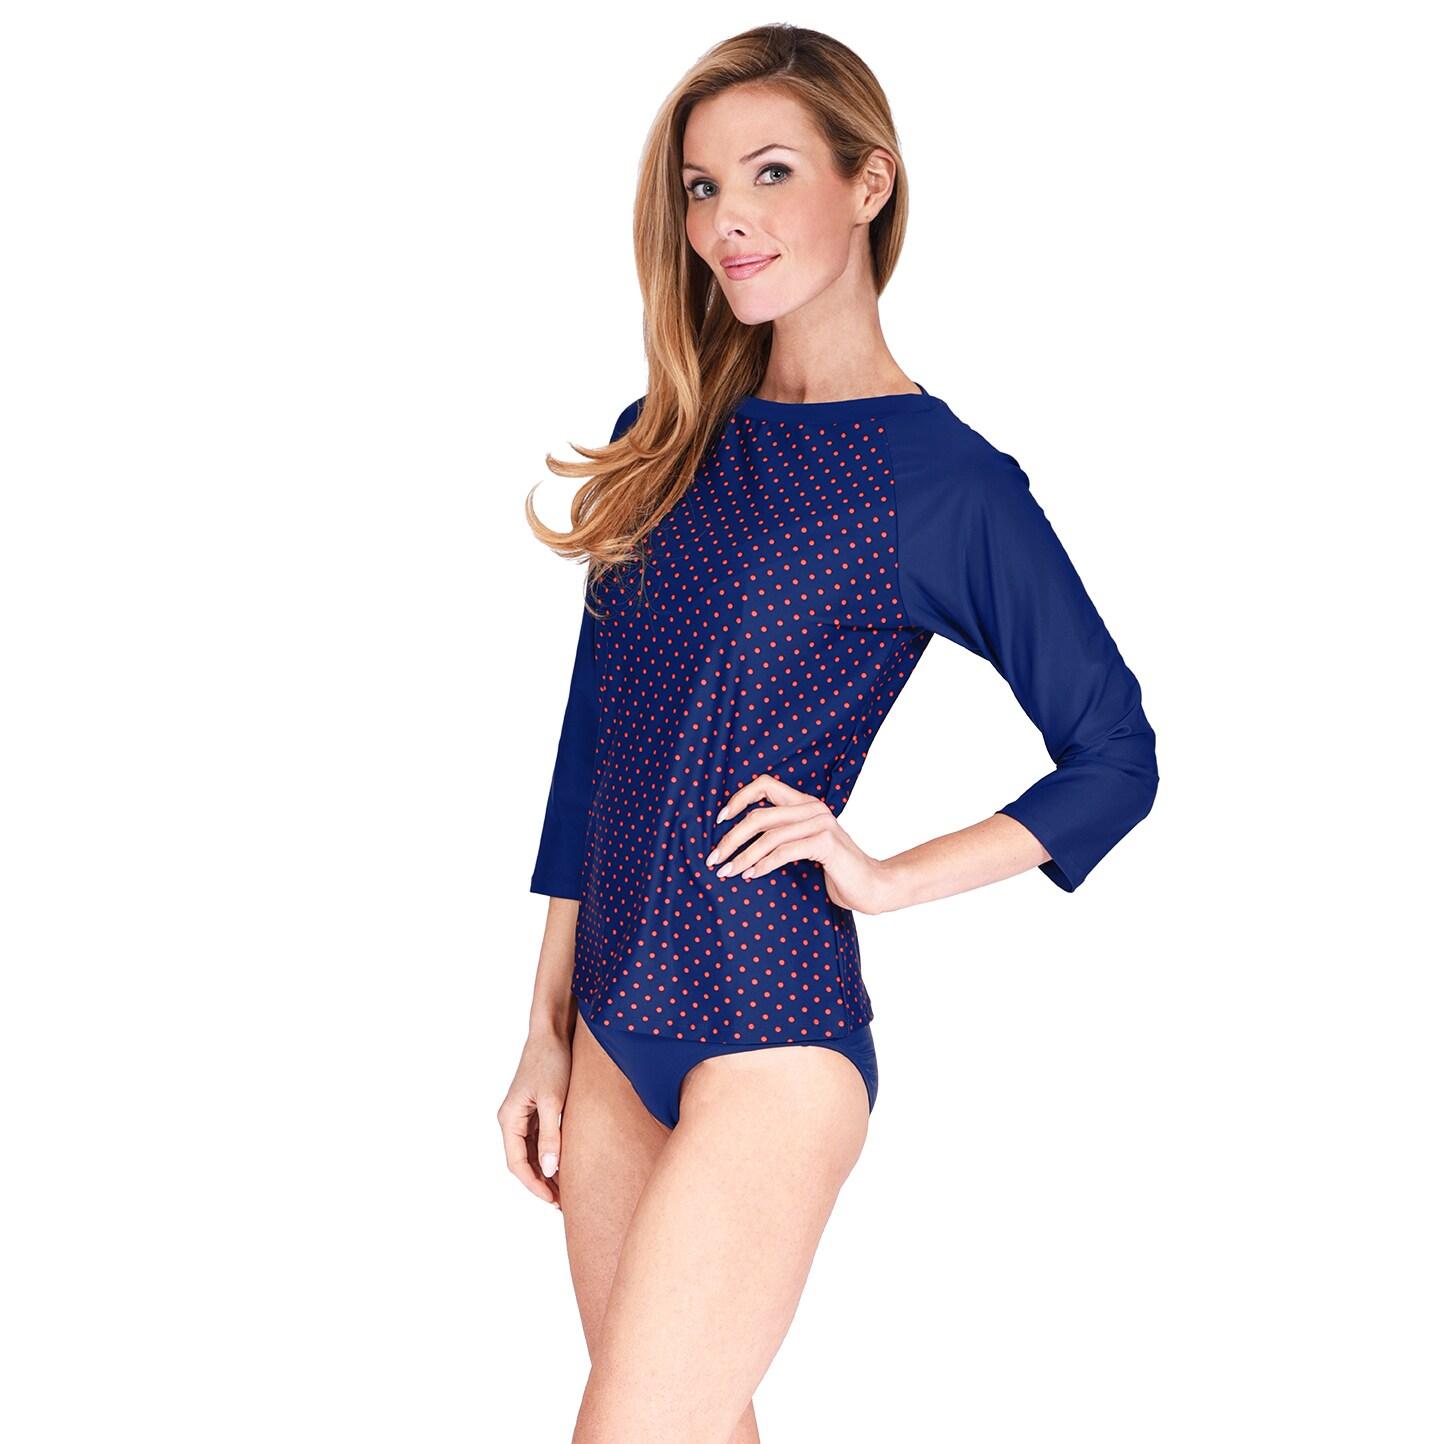 8e1e201d64 Shop Mazu Swim Boatneck Women's Rashguard - Free Shipping On Orders Over  $45 - Overstock - 14790376